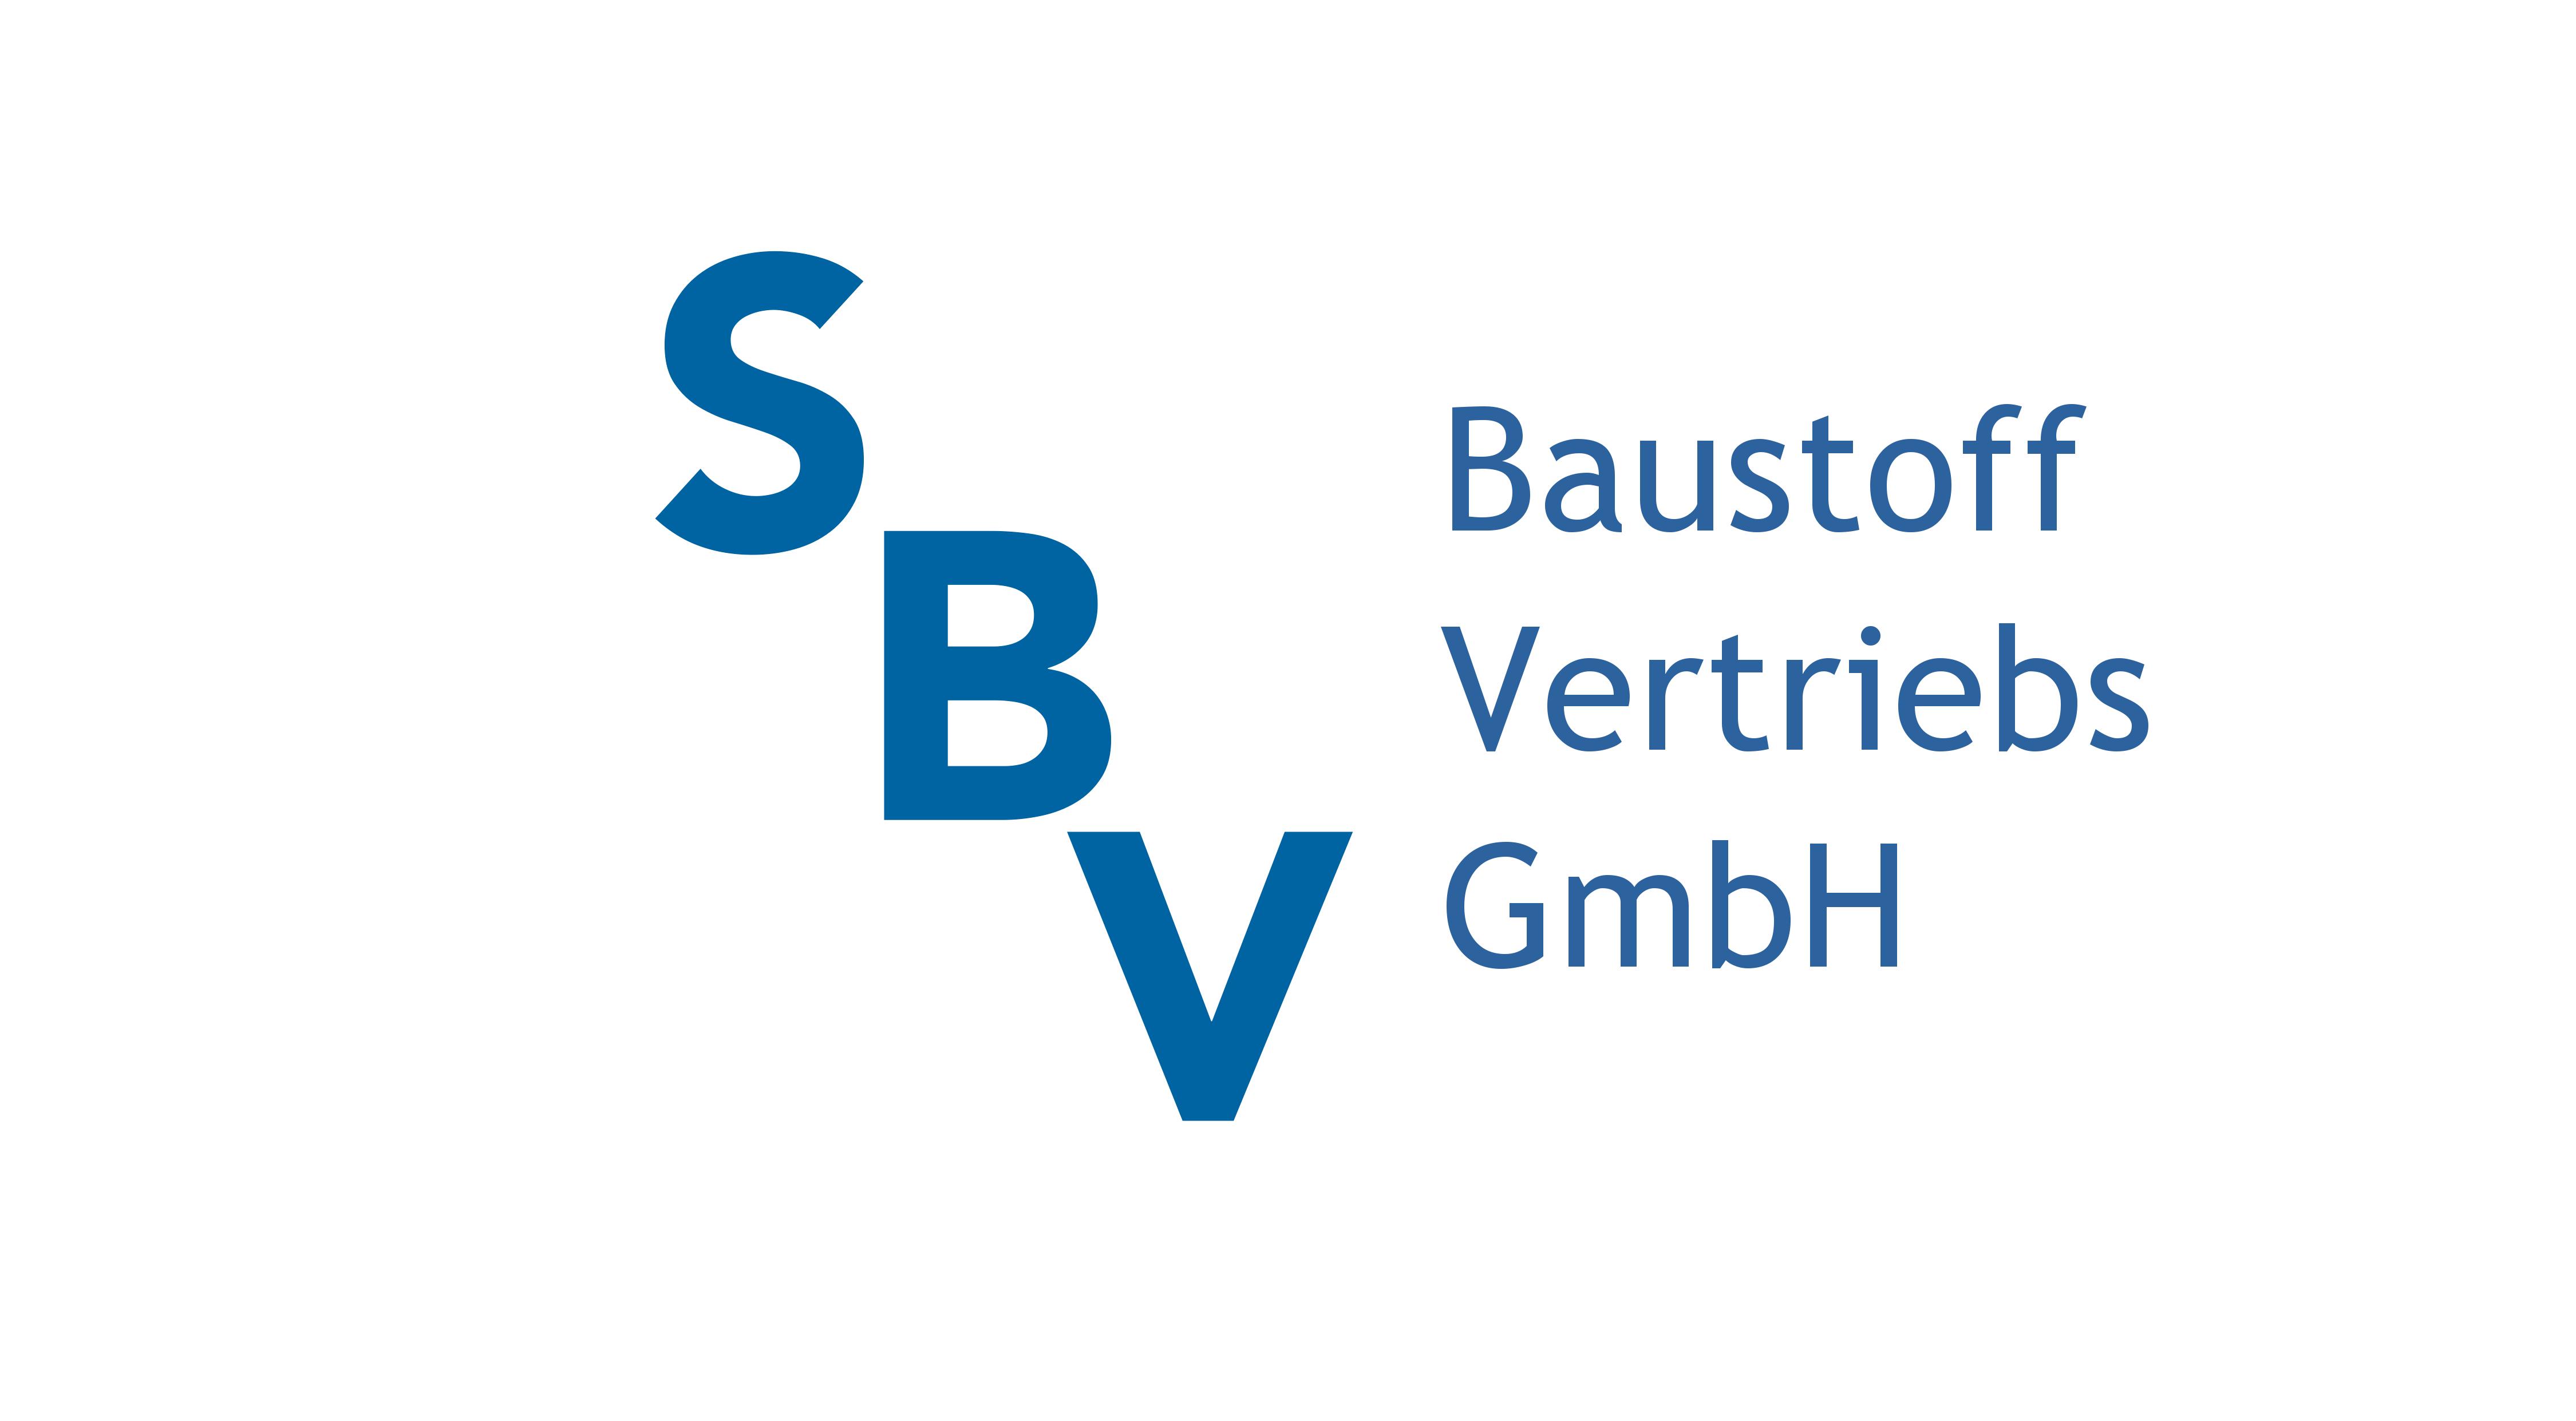 SBV Baustoff Vertriebs GmbH